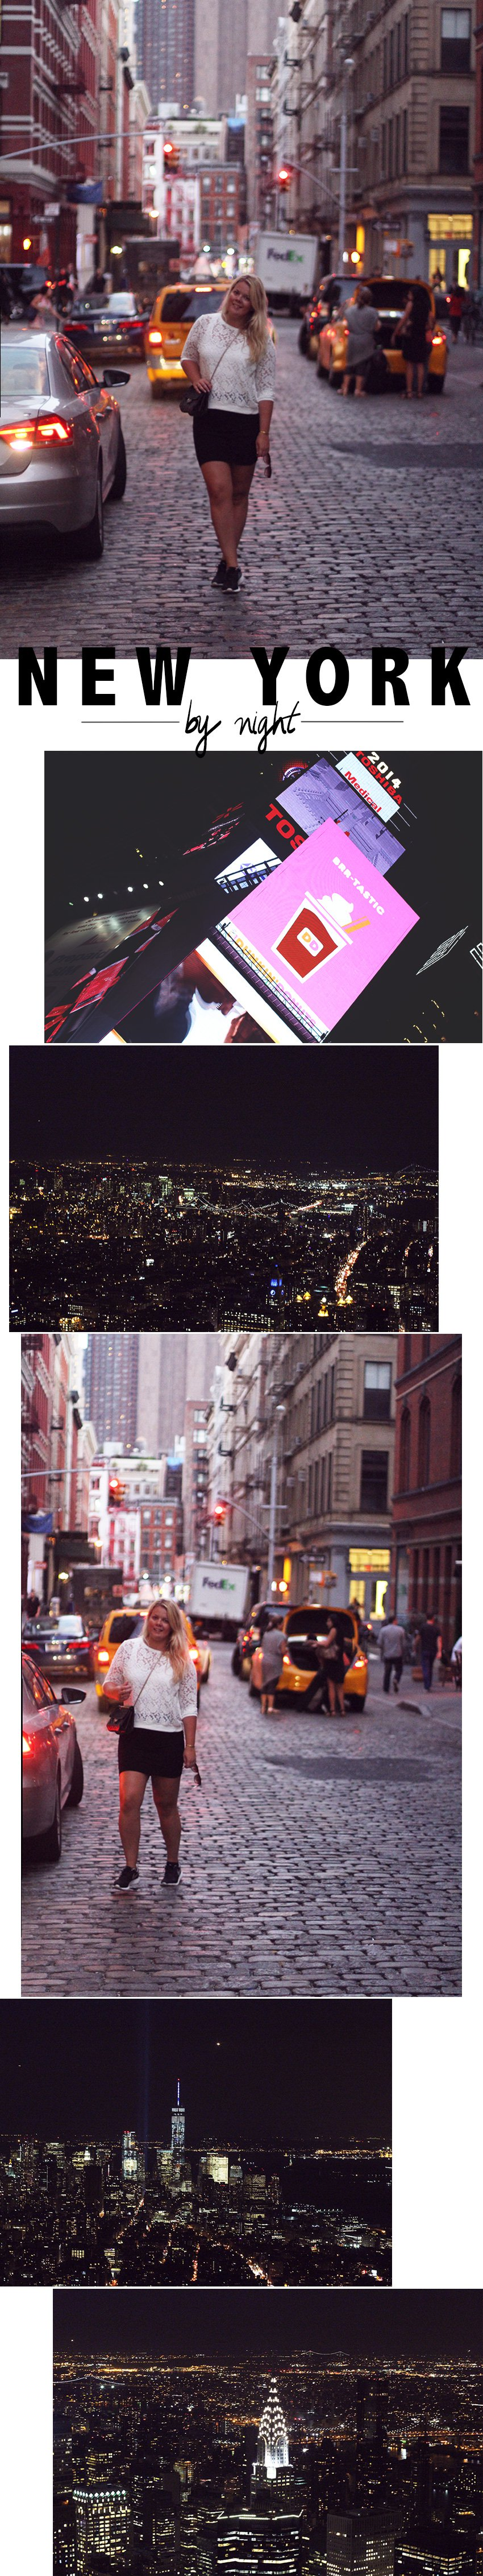 NEW YORK CITY <i>by night</i>